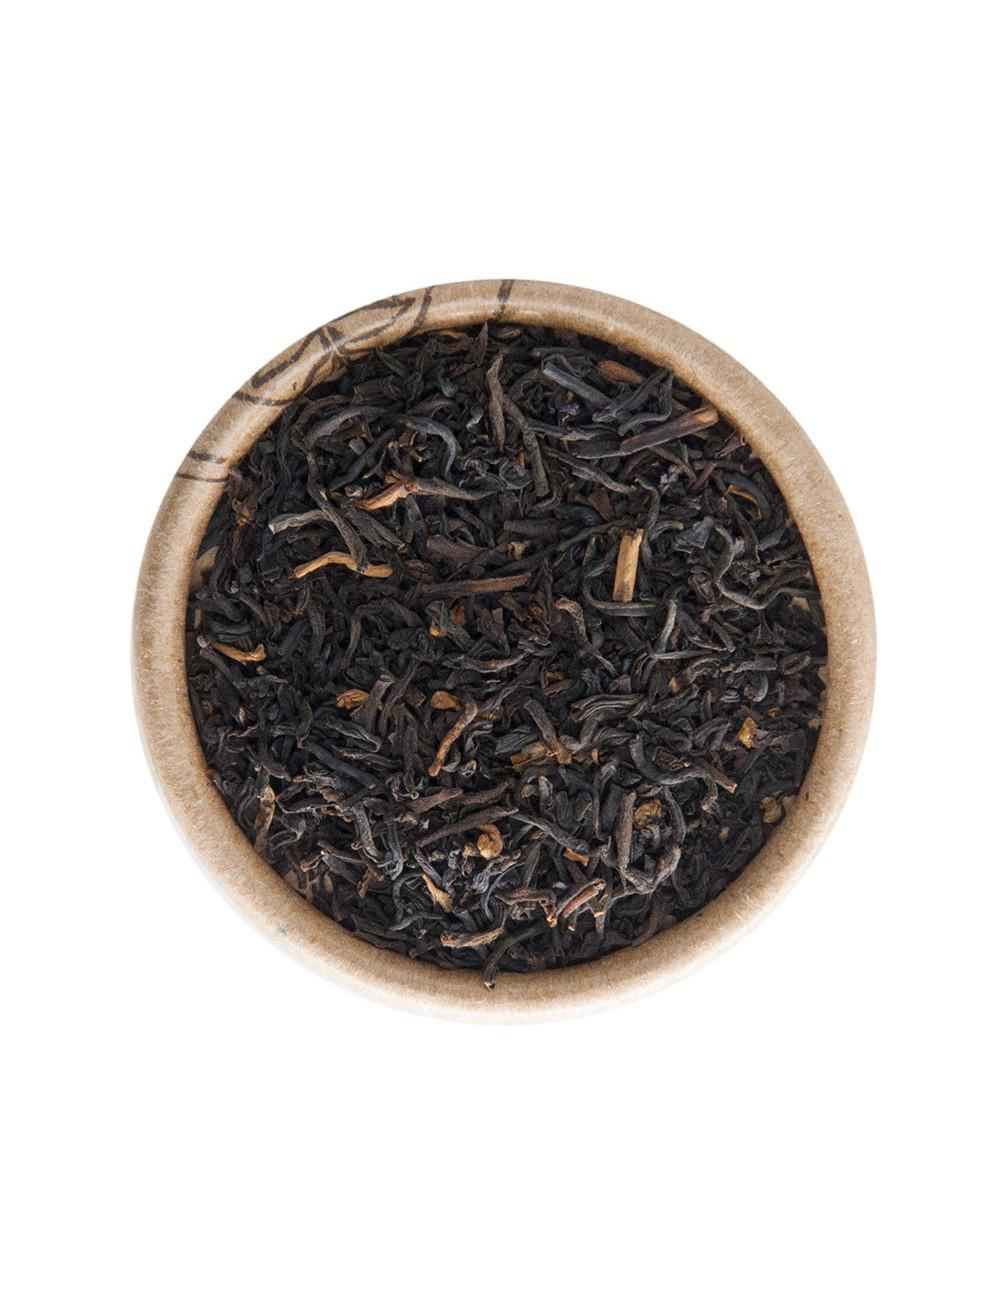 Ceylon OP Deteinato tè nero - La Pianta del Tè shop online